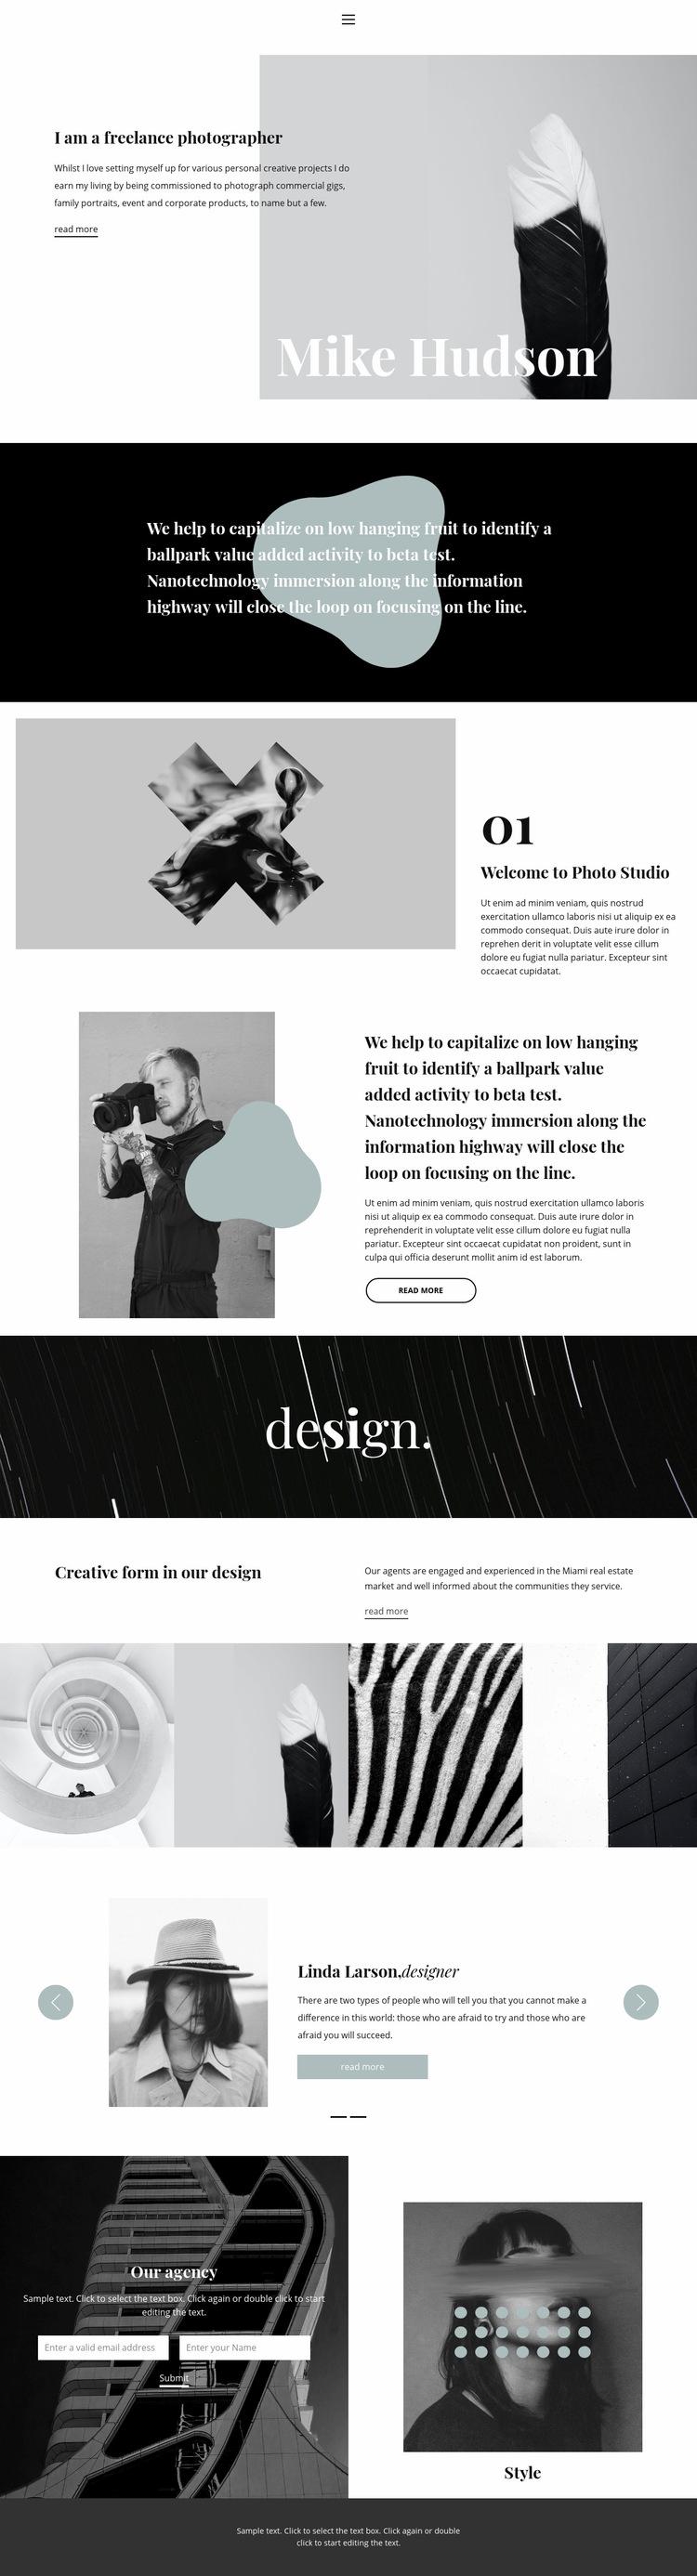 Professional photographer Web Page Design